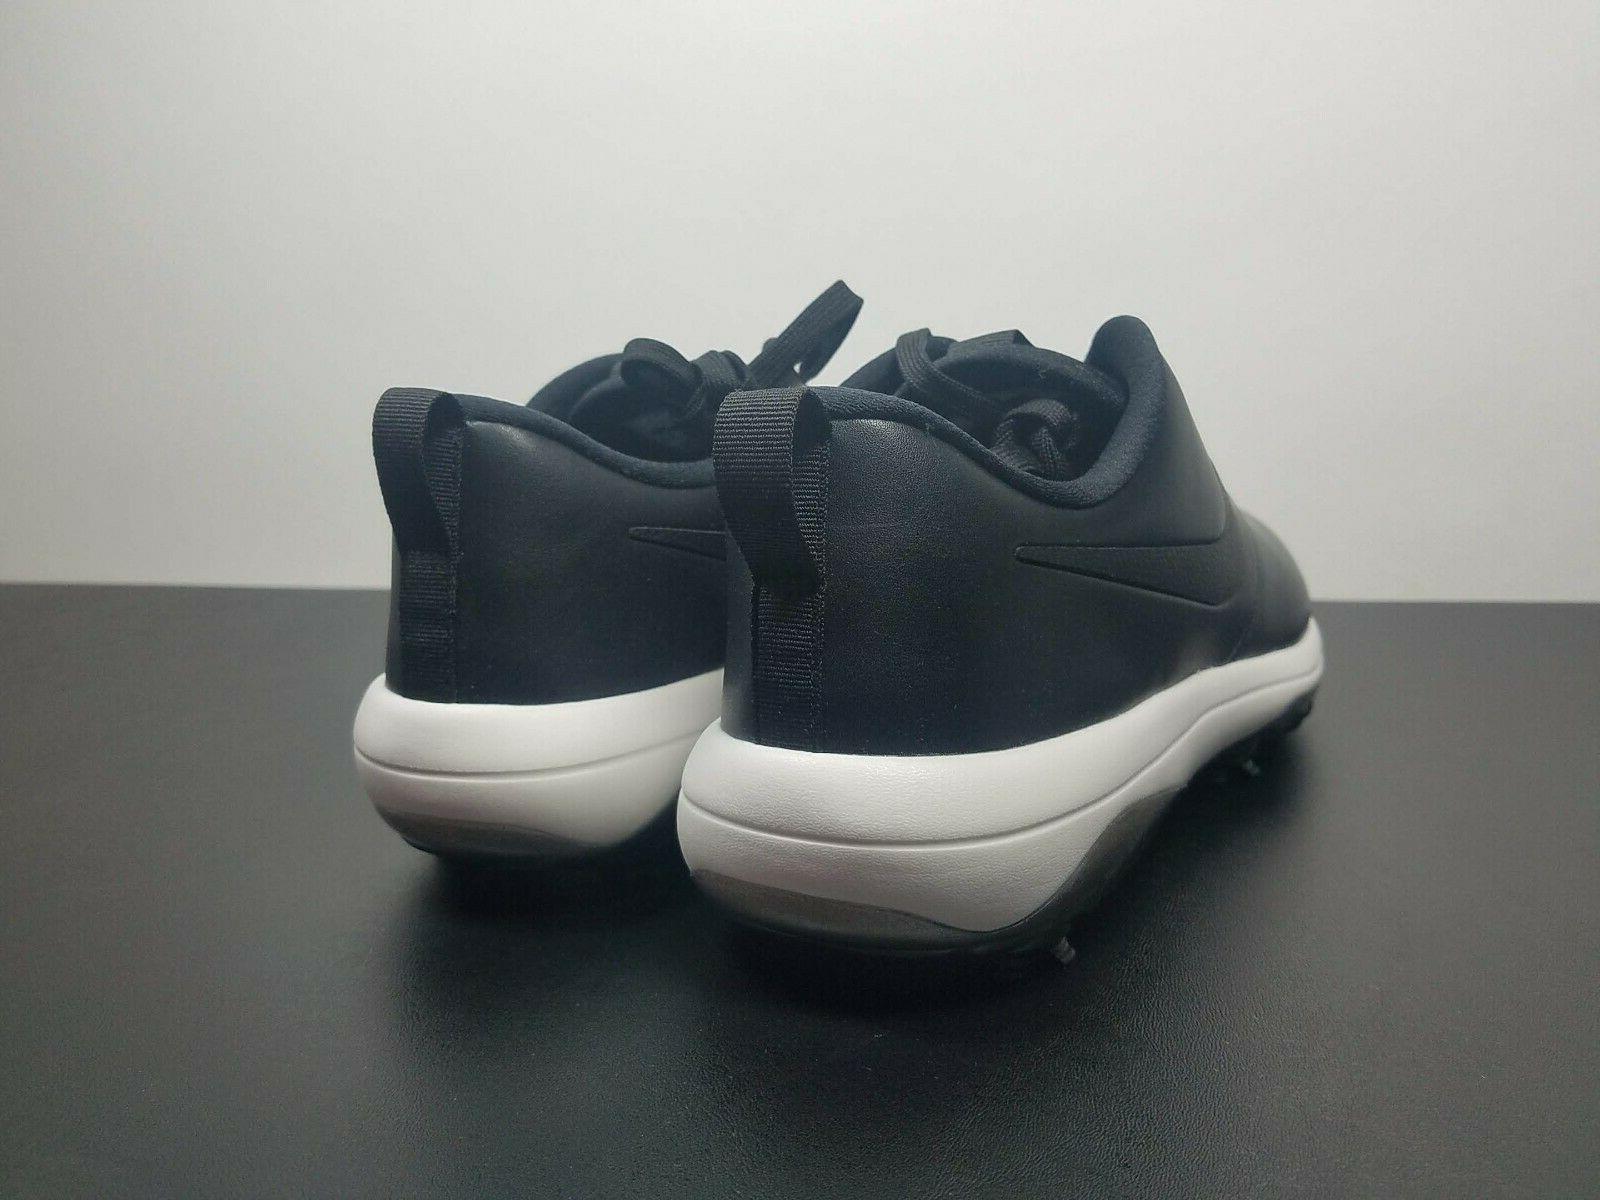 Nike Roshe AR5580-001 Men's Golf Shoes Cleats Multi-Sz